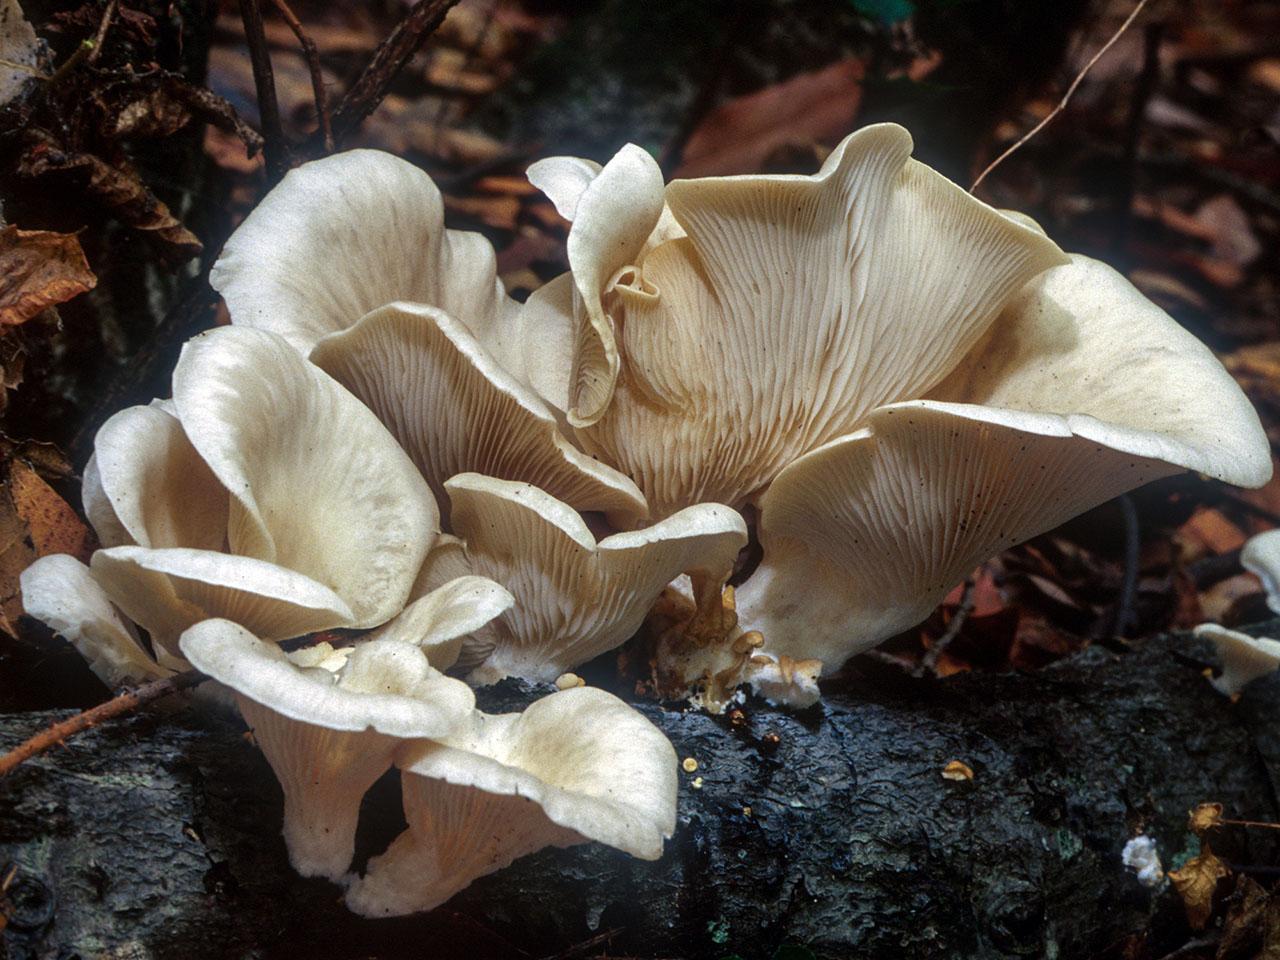 California Fungi: Pleurotus ostreatus